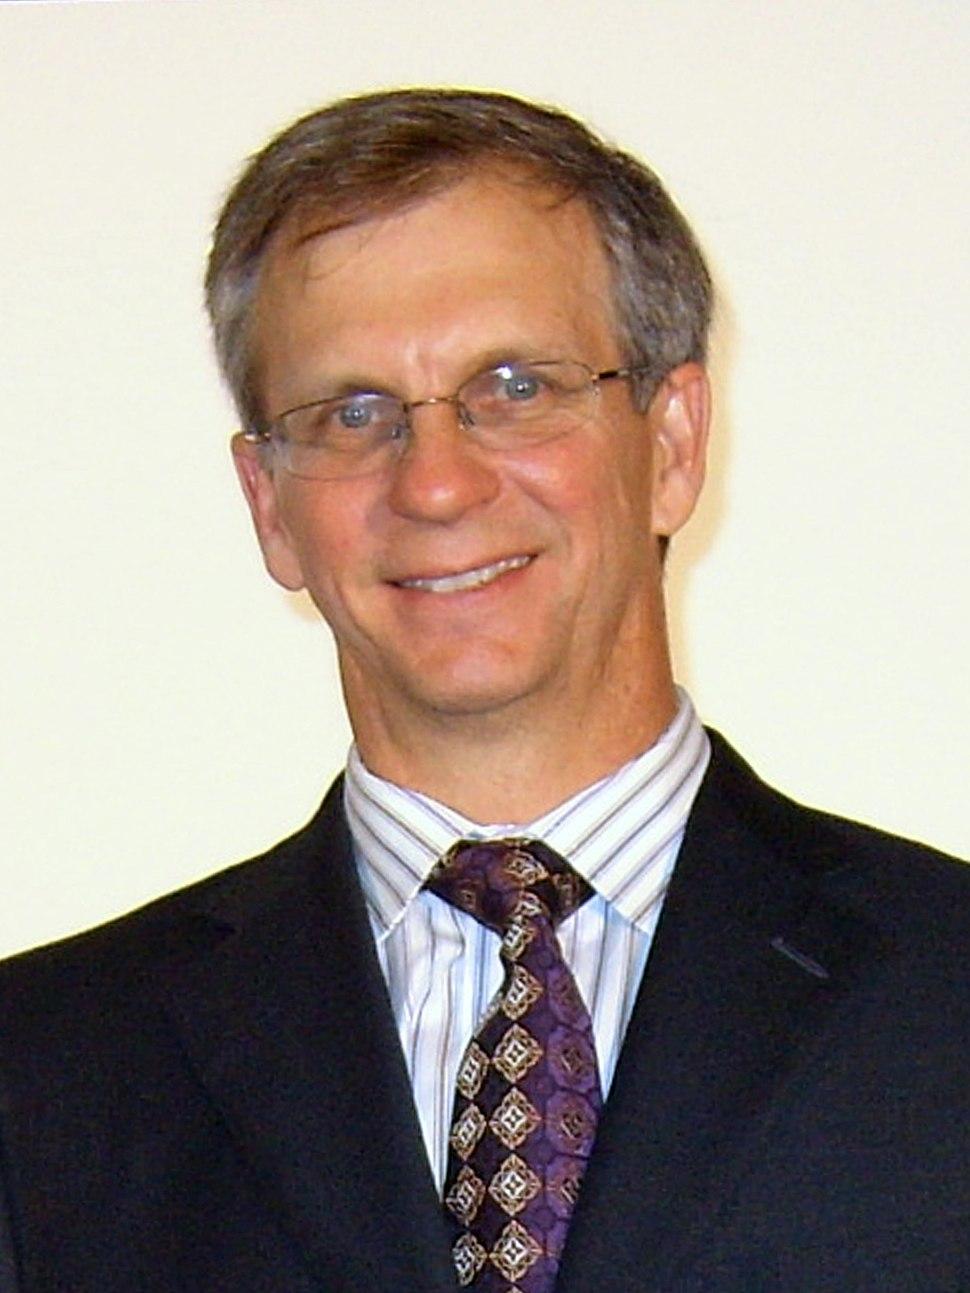 Alan Eustace in 2008